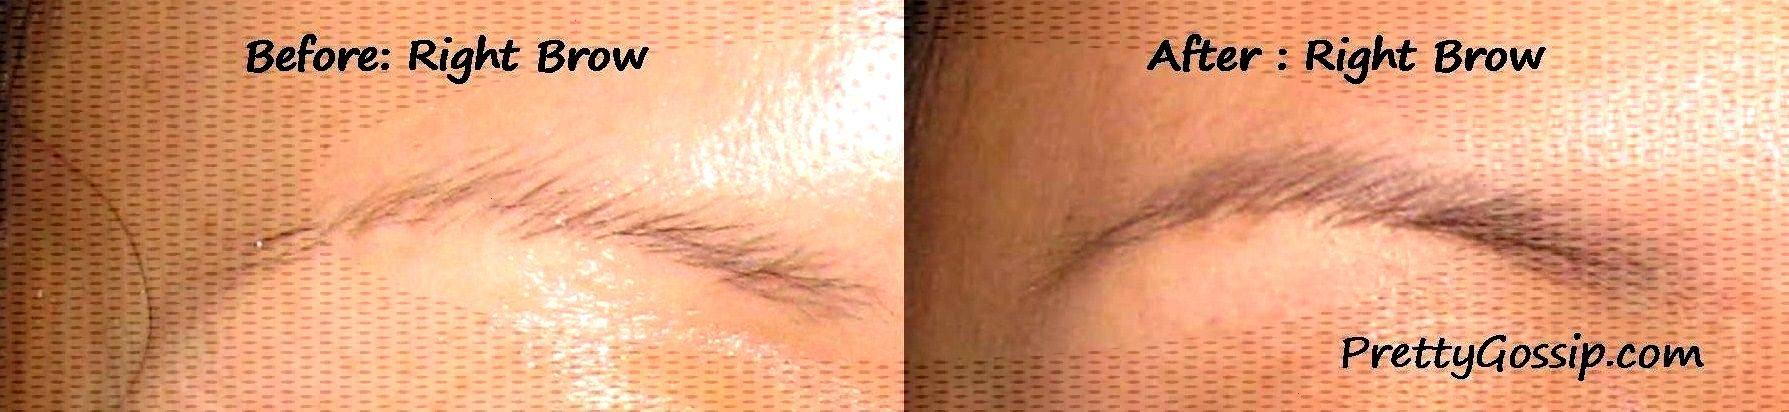 PrettyGossip- Before and After Eyebrow Tattoo- Right Sherrys Studio, LA CA